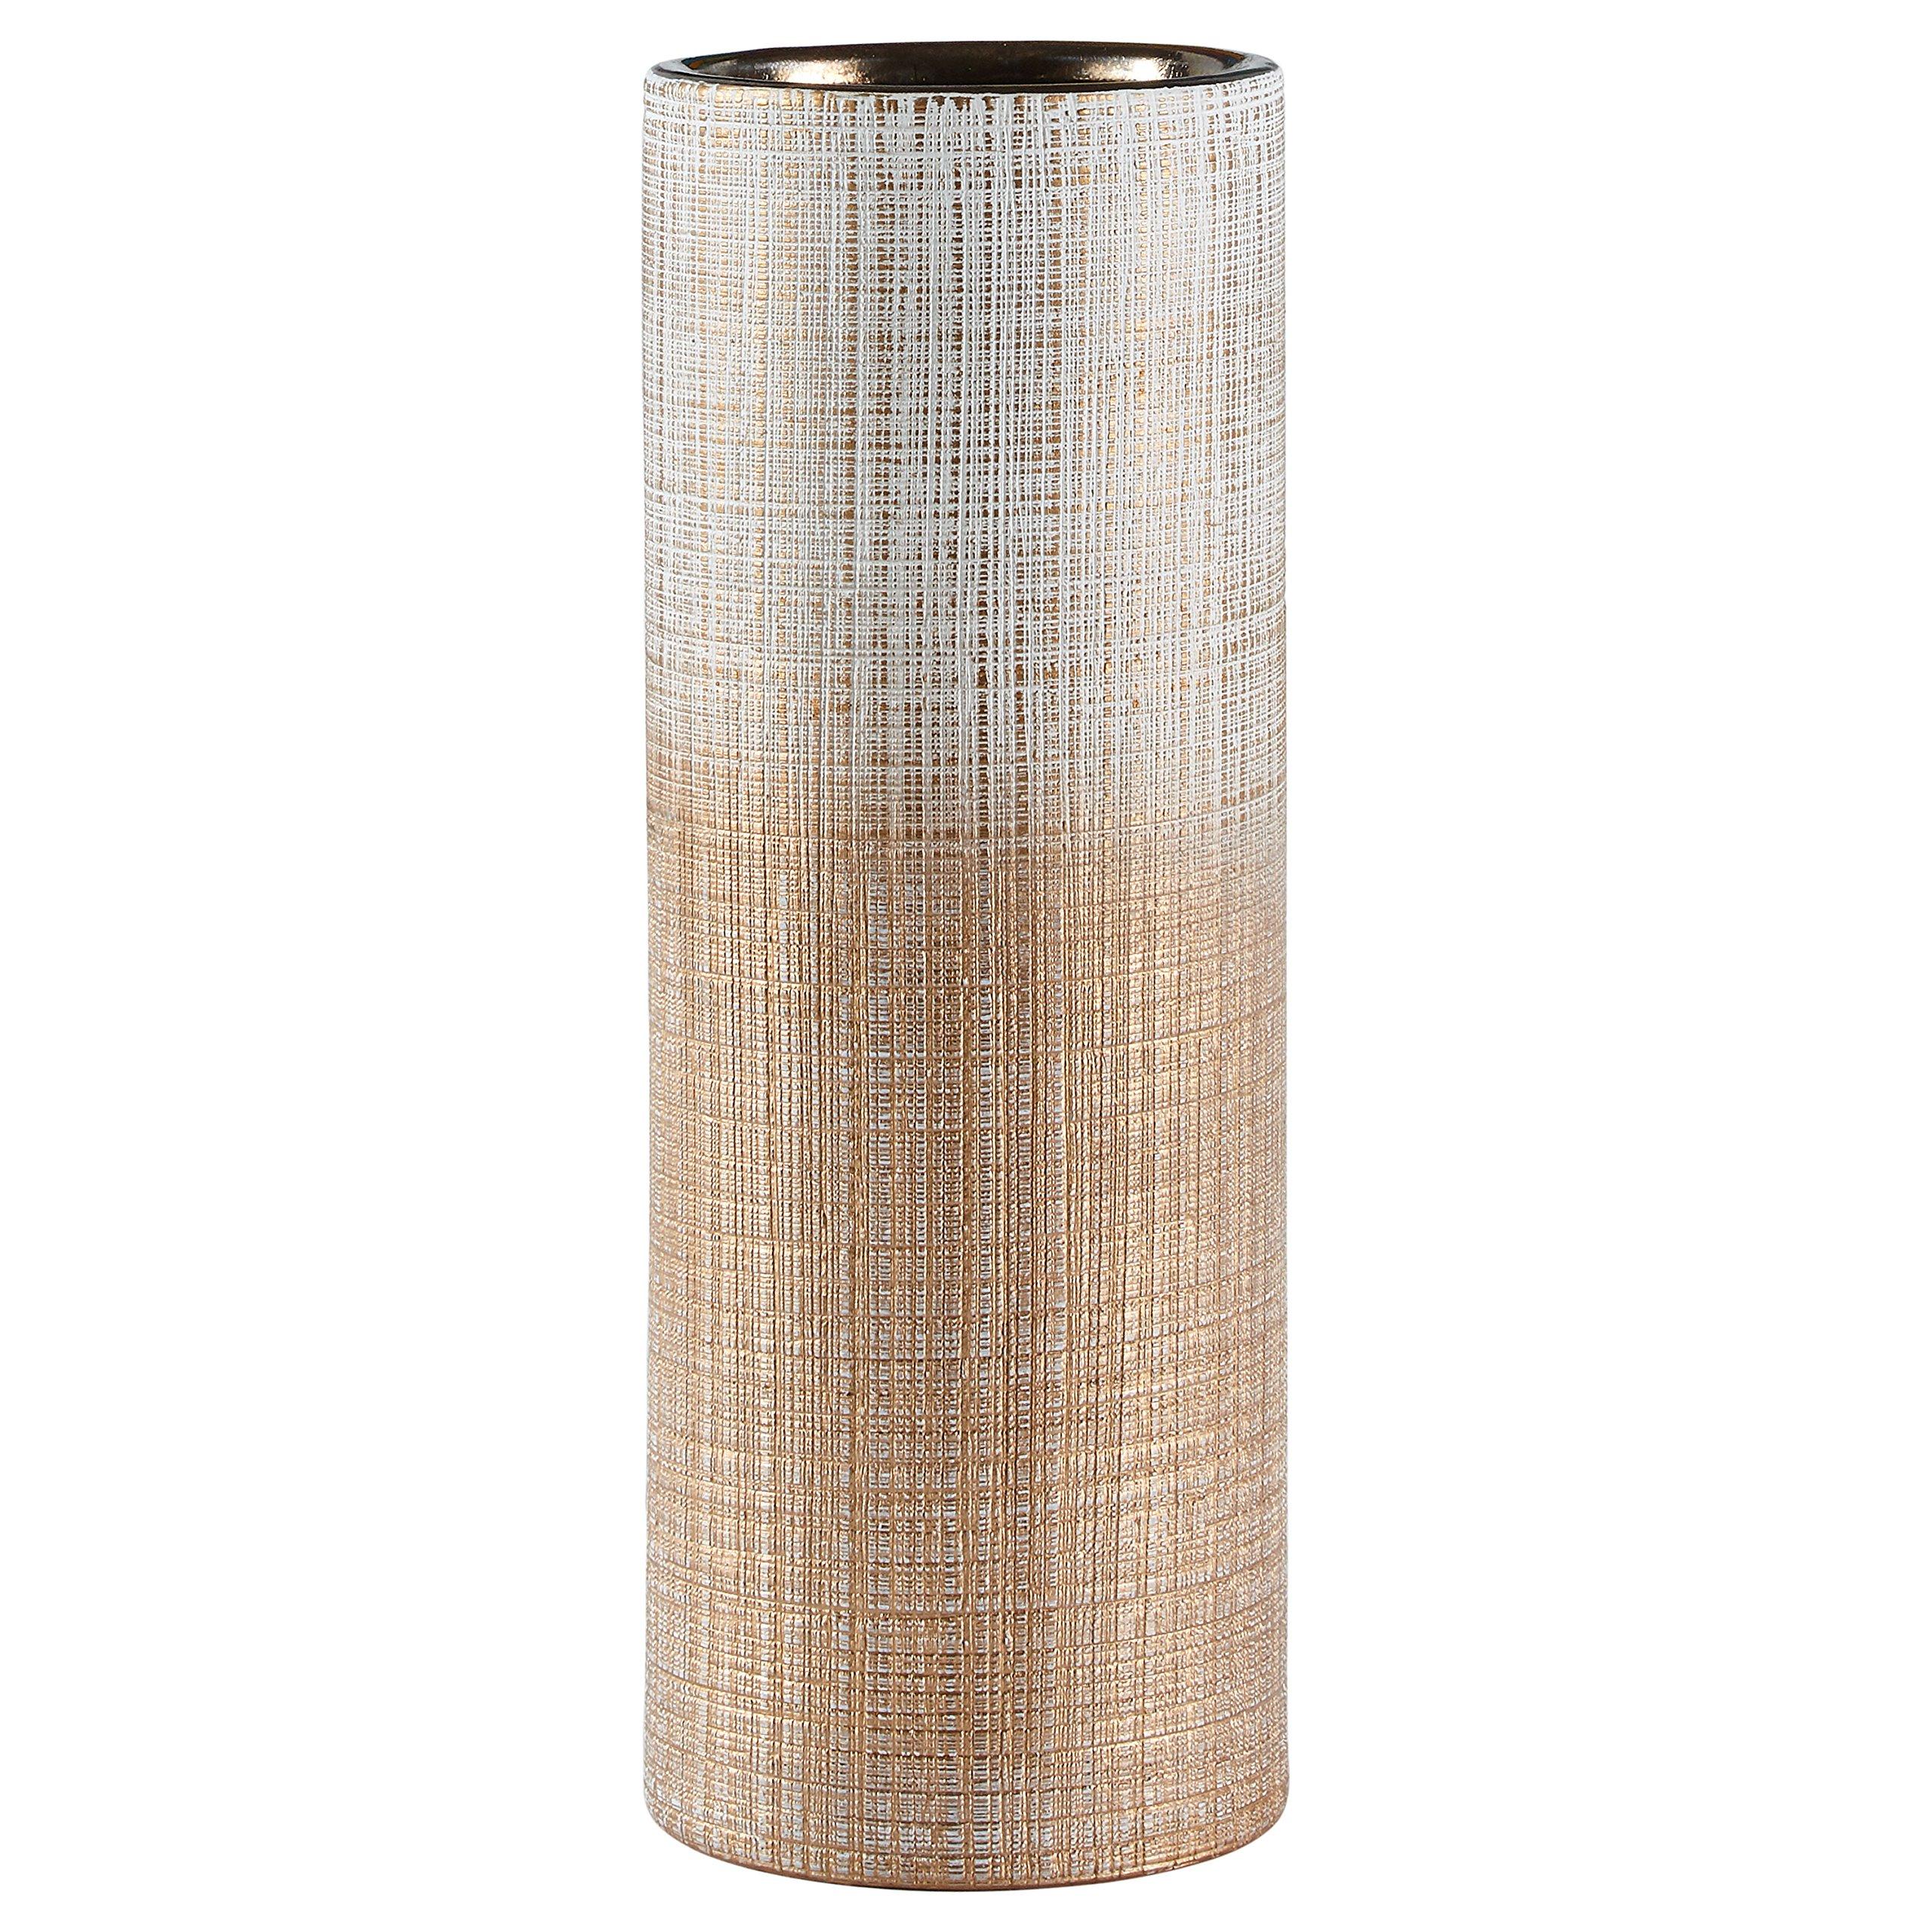 CDM product Rivet Rustic Textured Stoneware Tall Decorative Vase, 11 Inch Height, Bronze big image